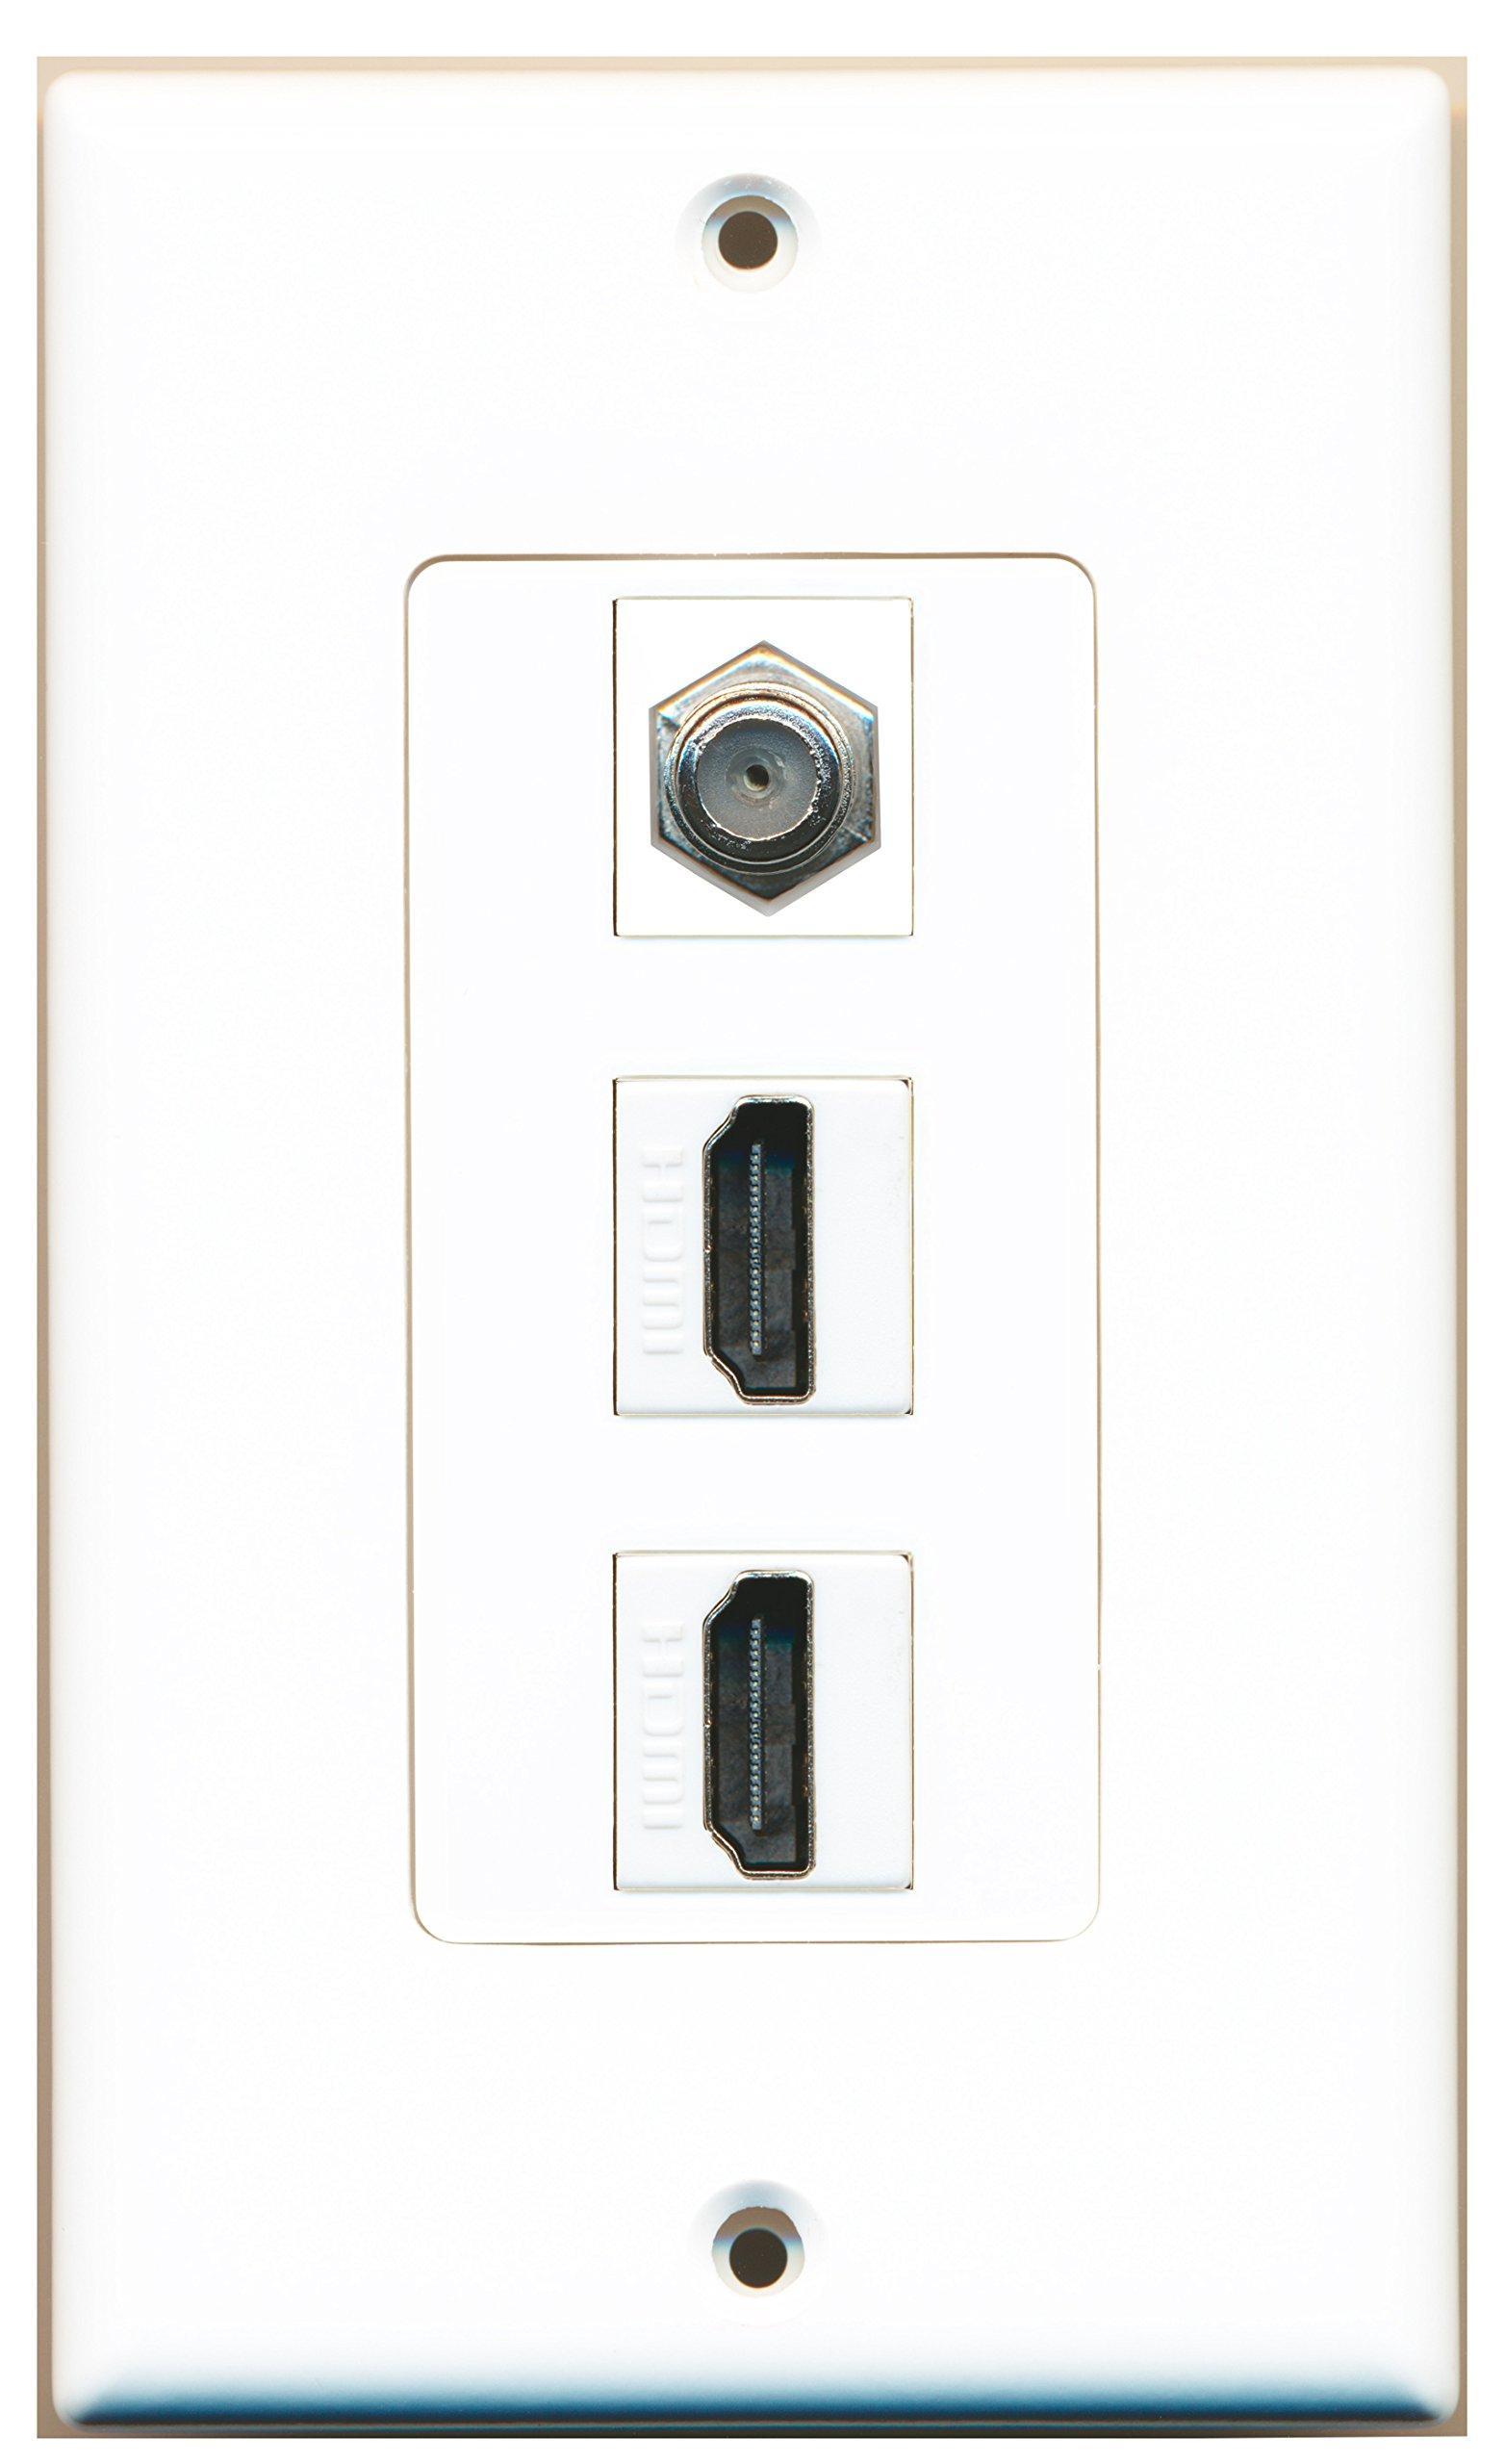 RiteAV - 2 Port HDMI 1 Coax Cable TV- F-Type Decorative Wall Plate